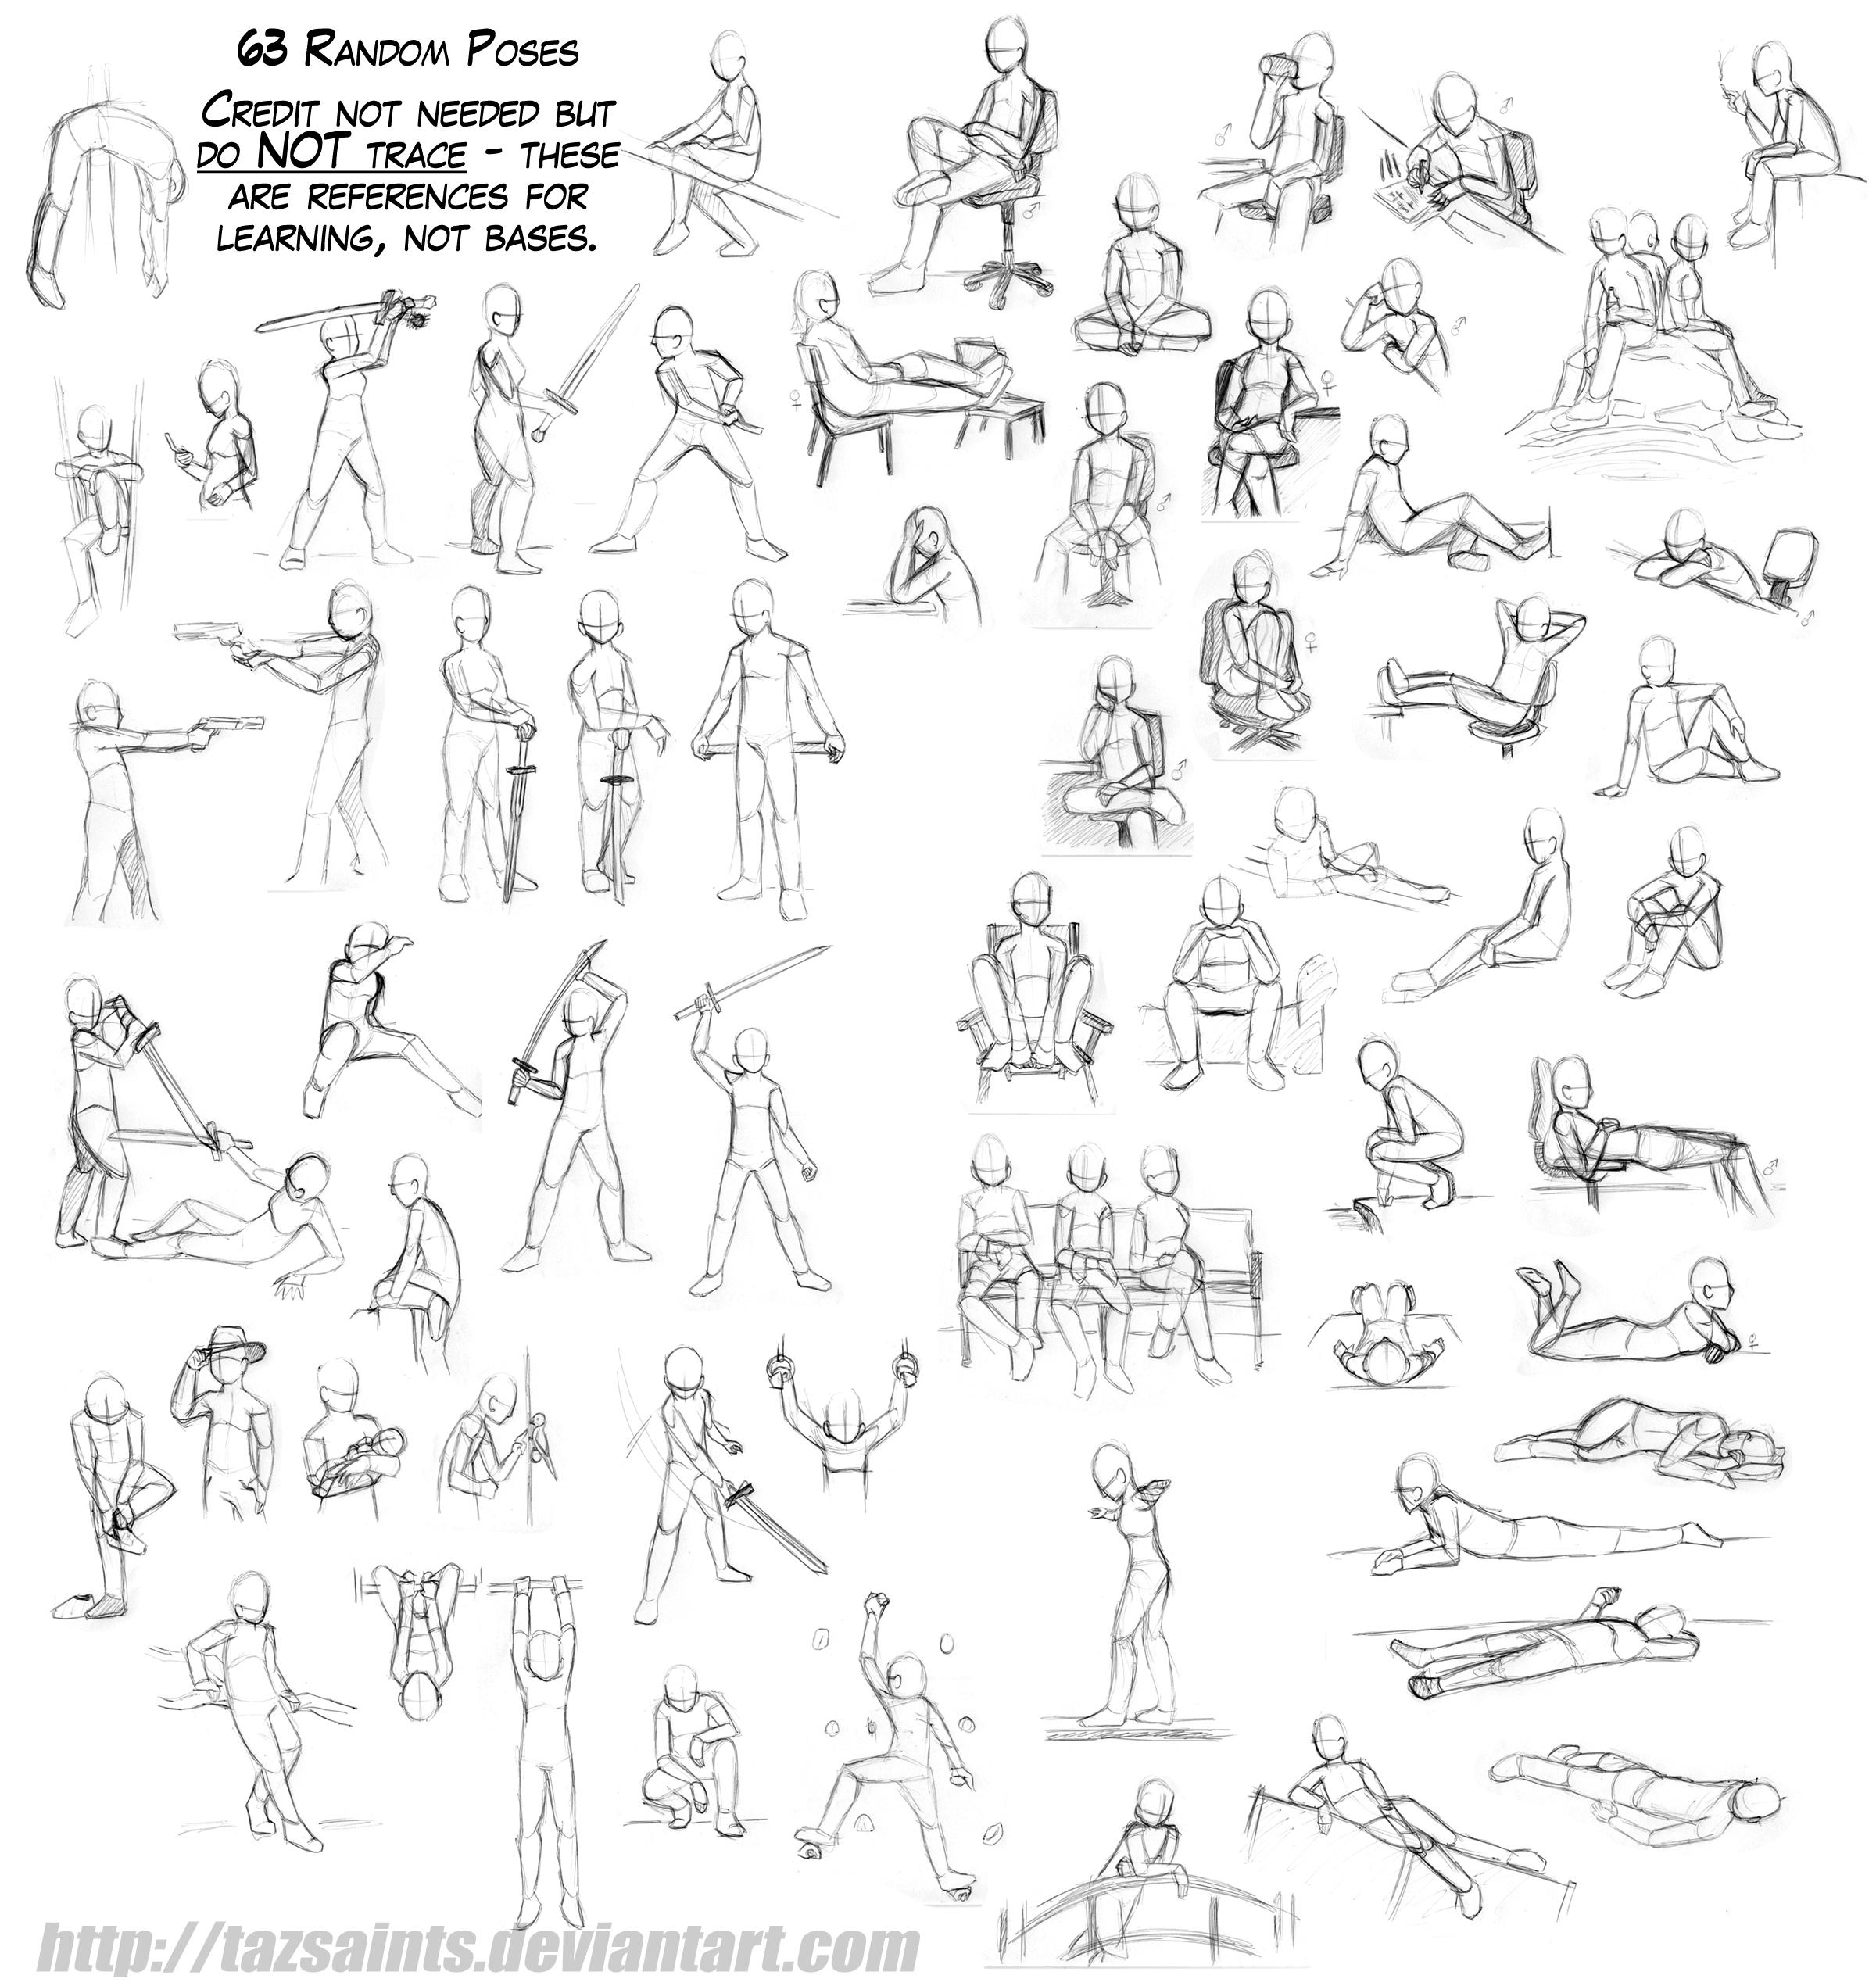 63 Random Poses by tazsaints